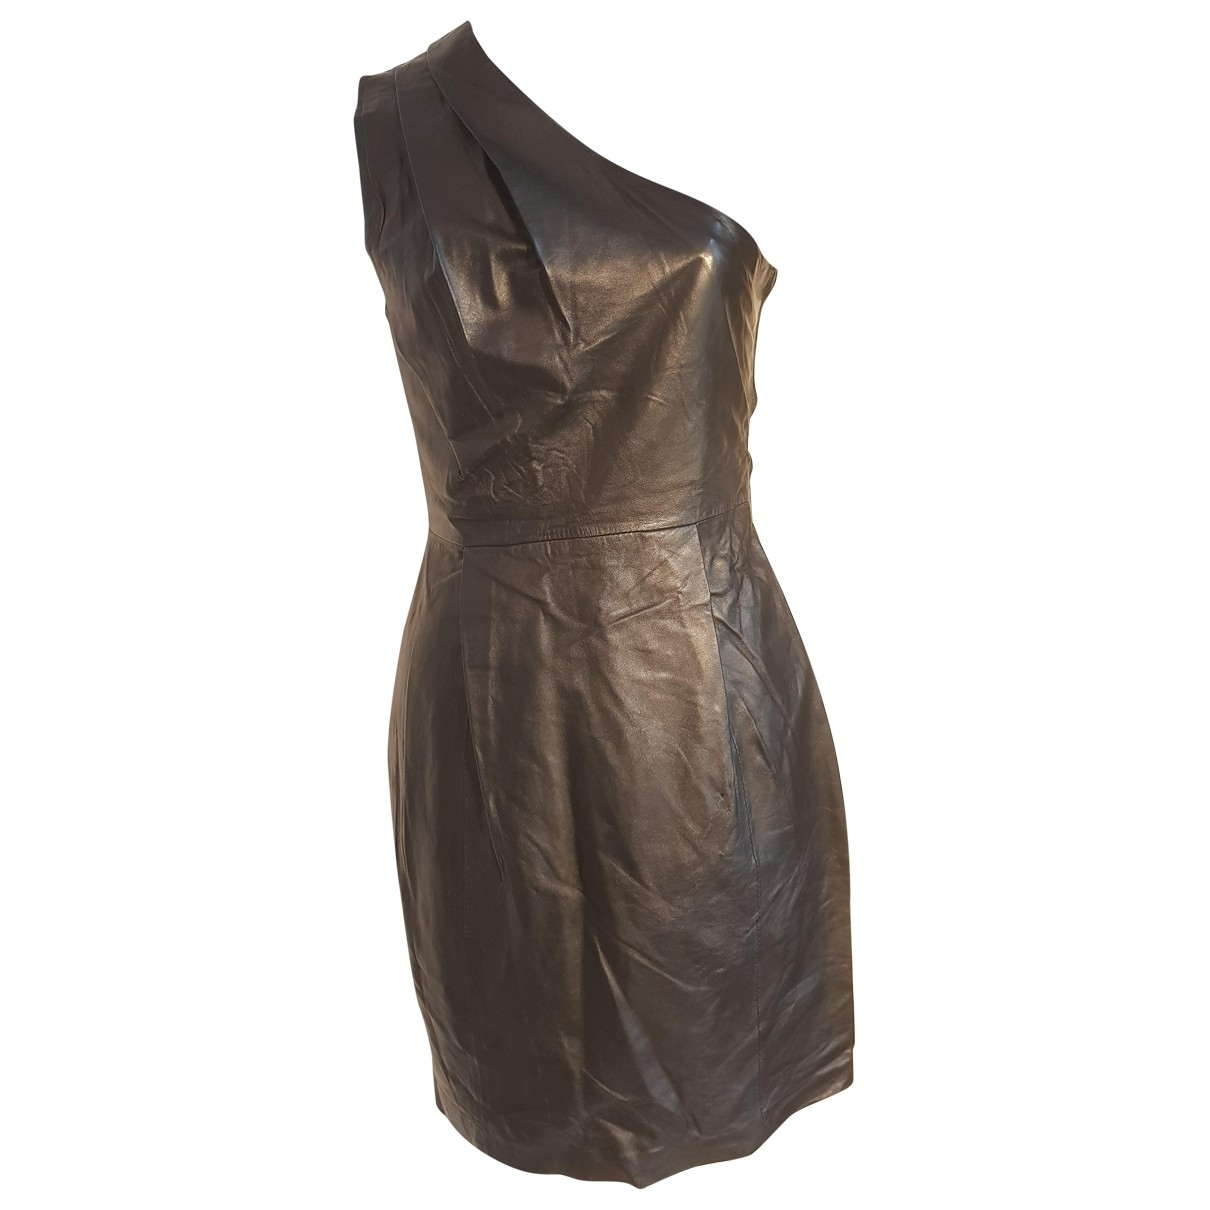 Jimmy Choo For H&m \N Black Leather dress for Women L International